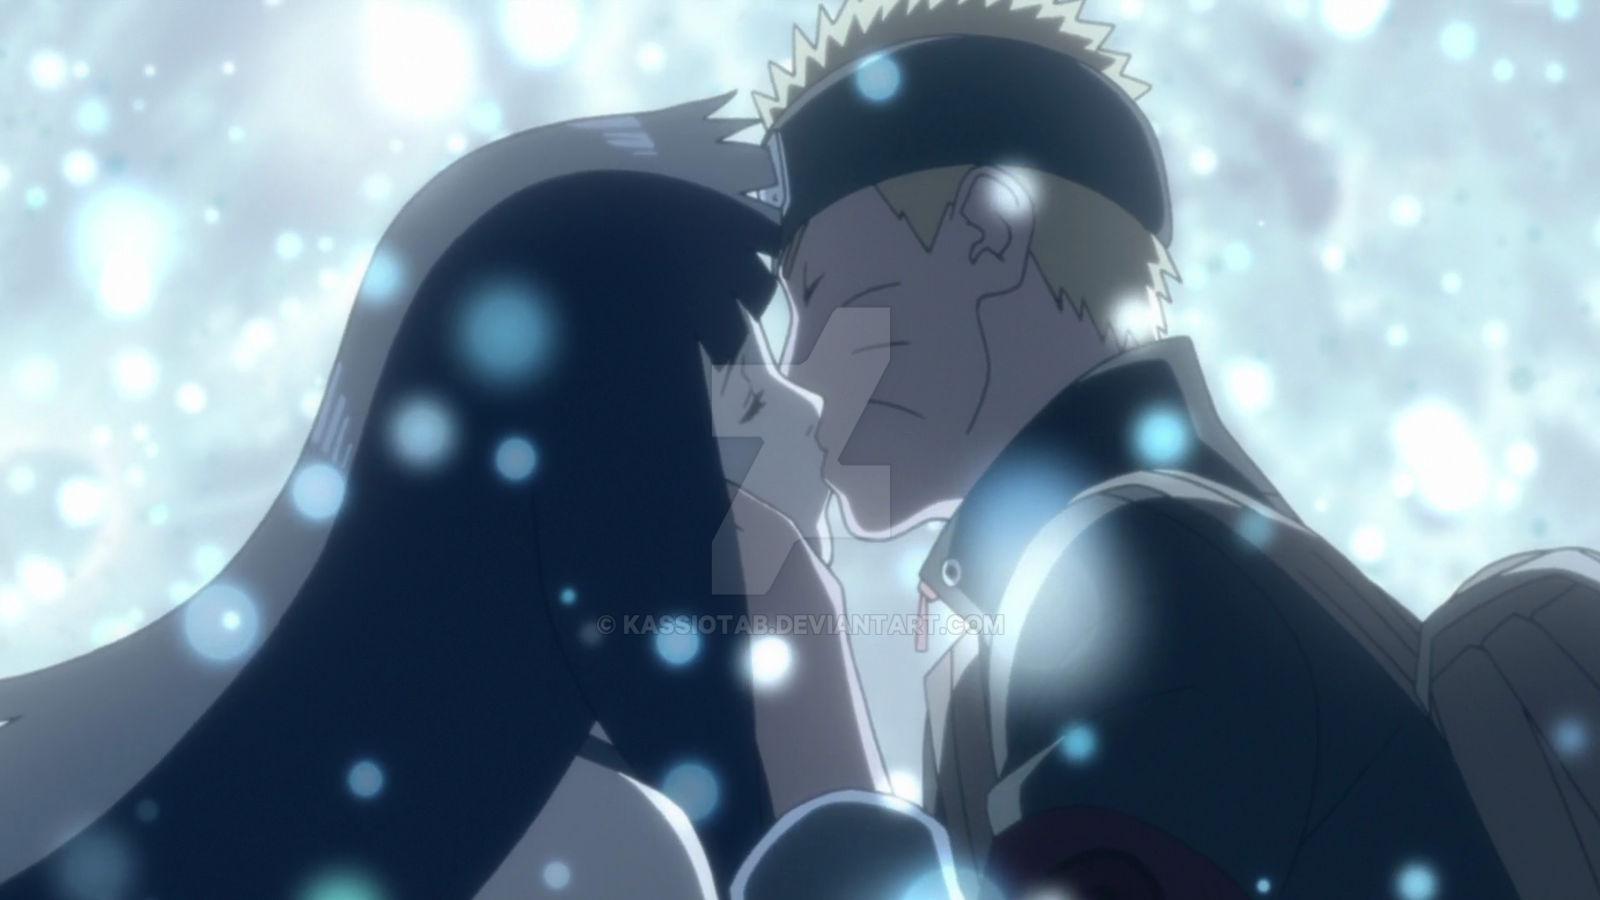 Couple Naruto E Hinata Wallpaper Anime Wallpaper Hd